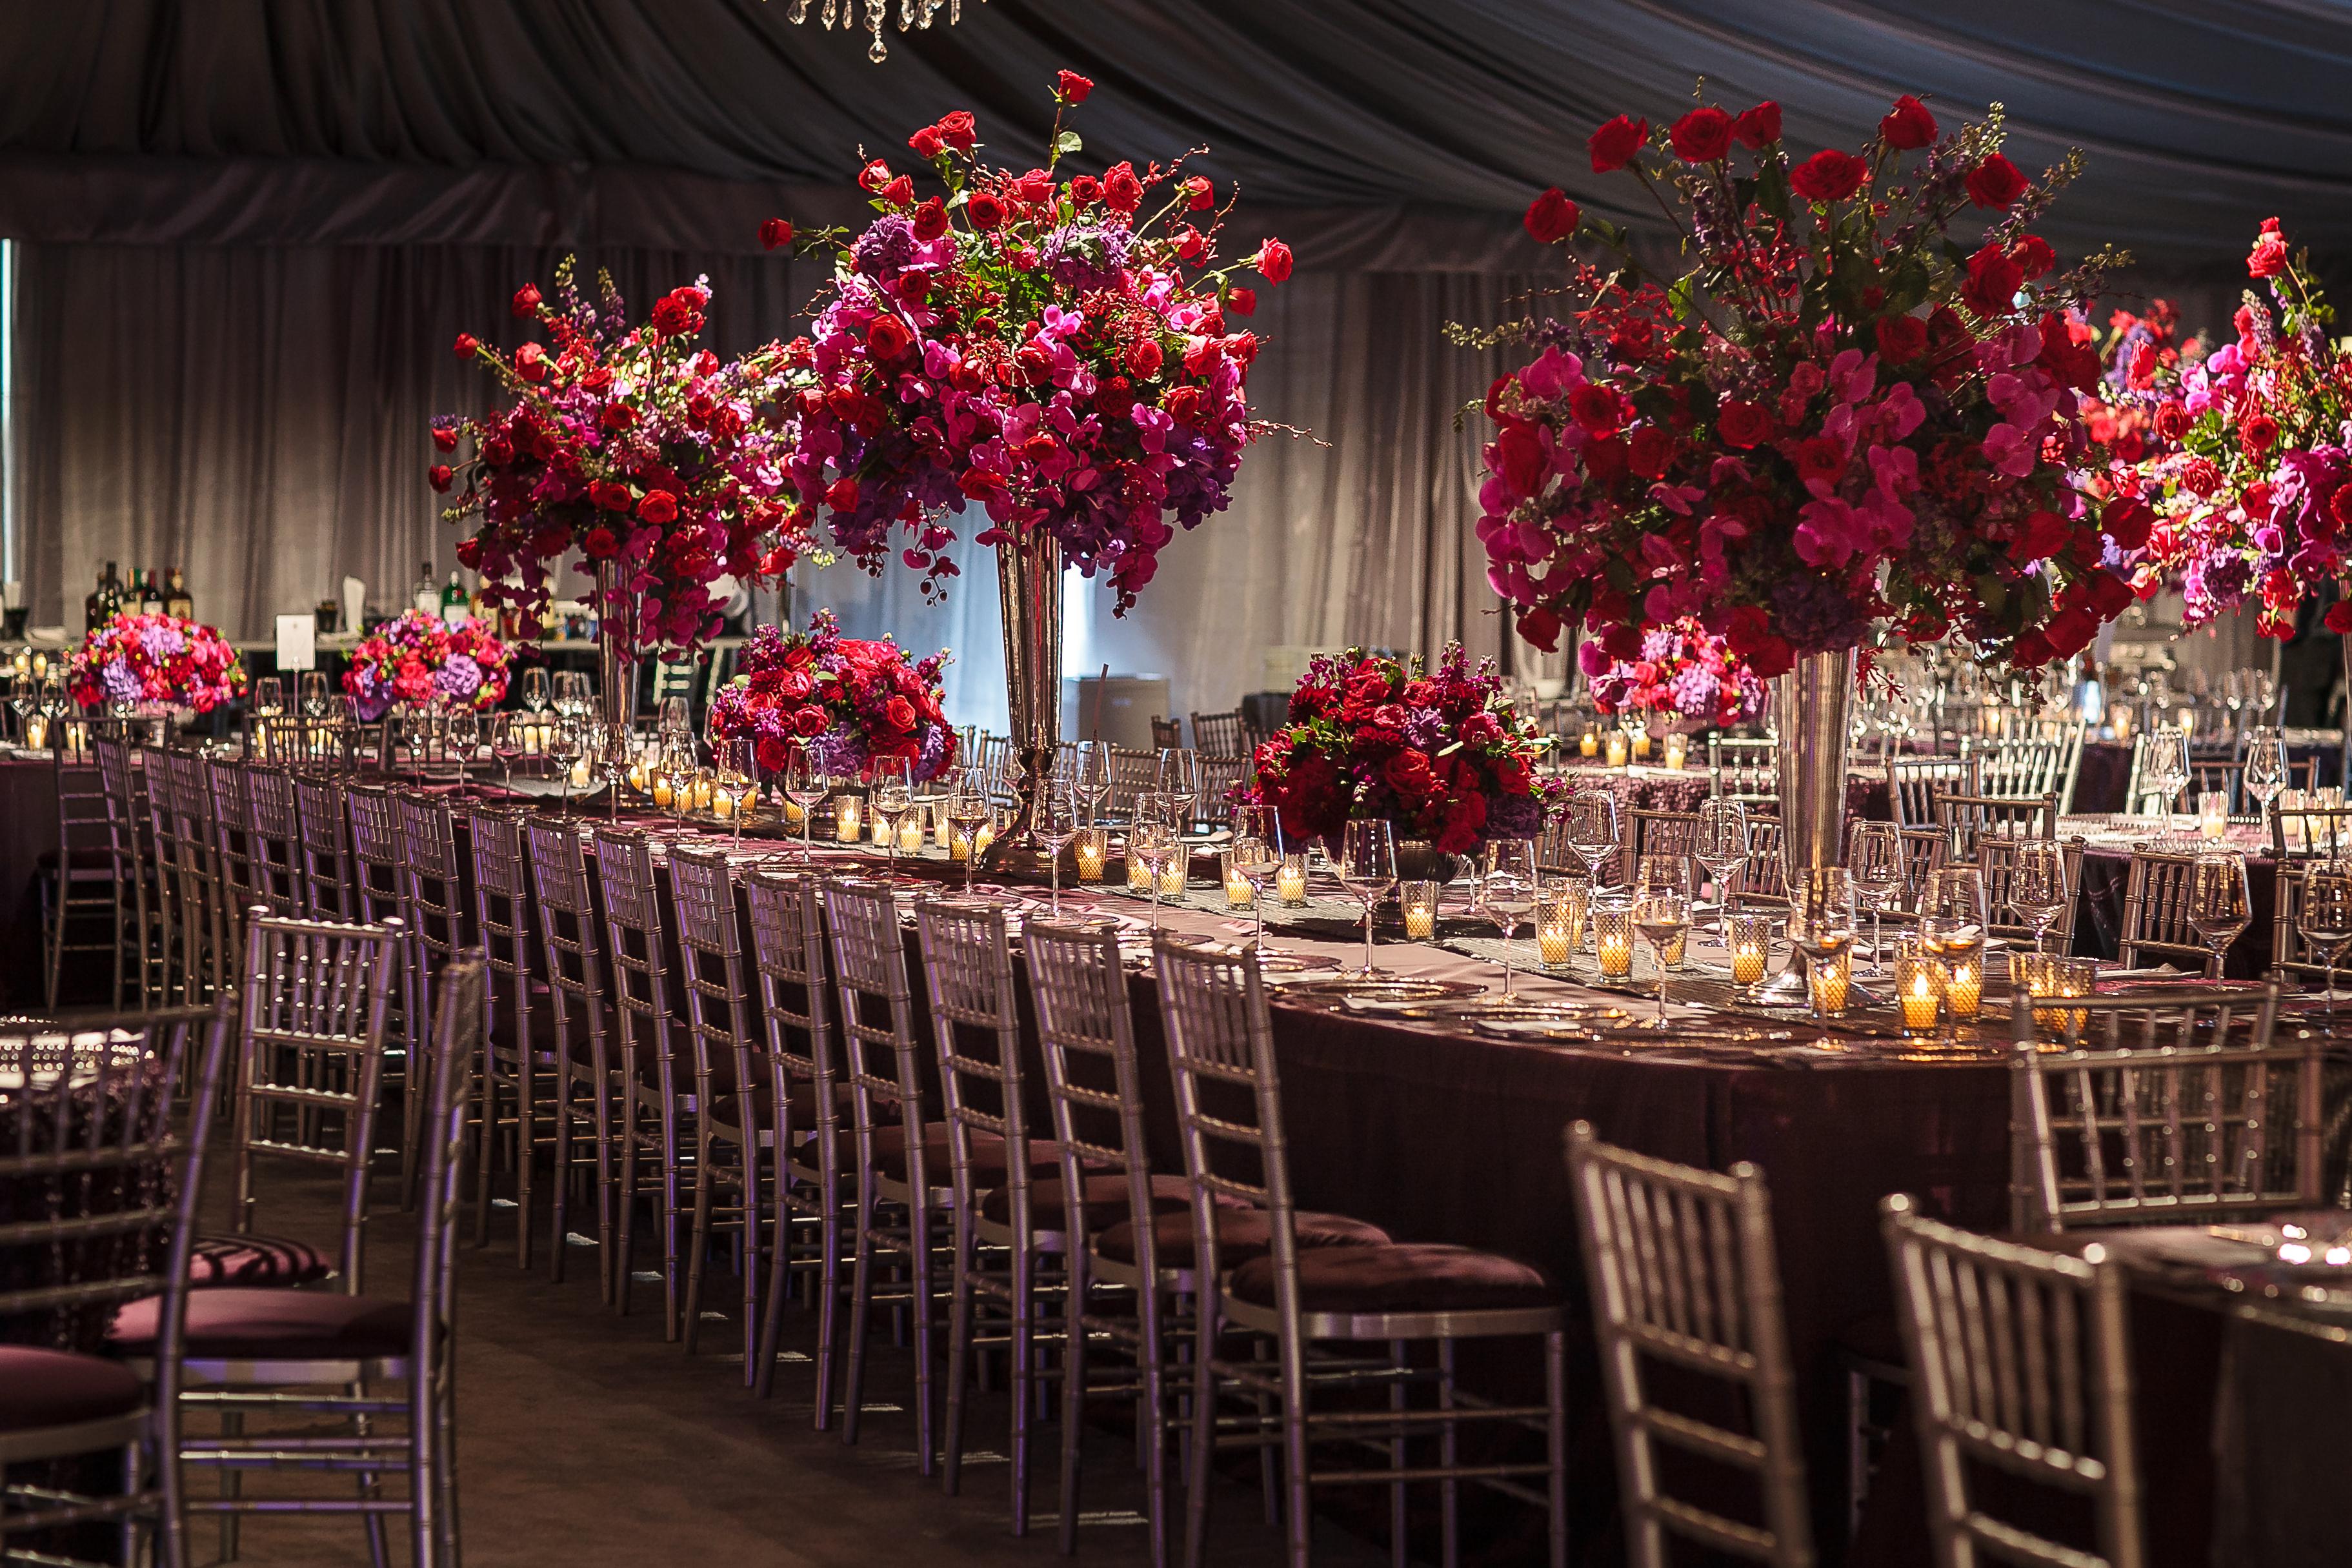 Elegant Tent Wedding - Signature Chandeliers